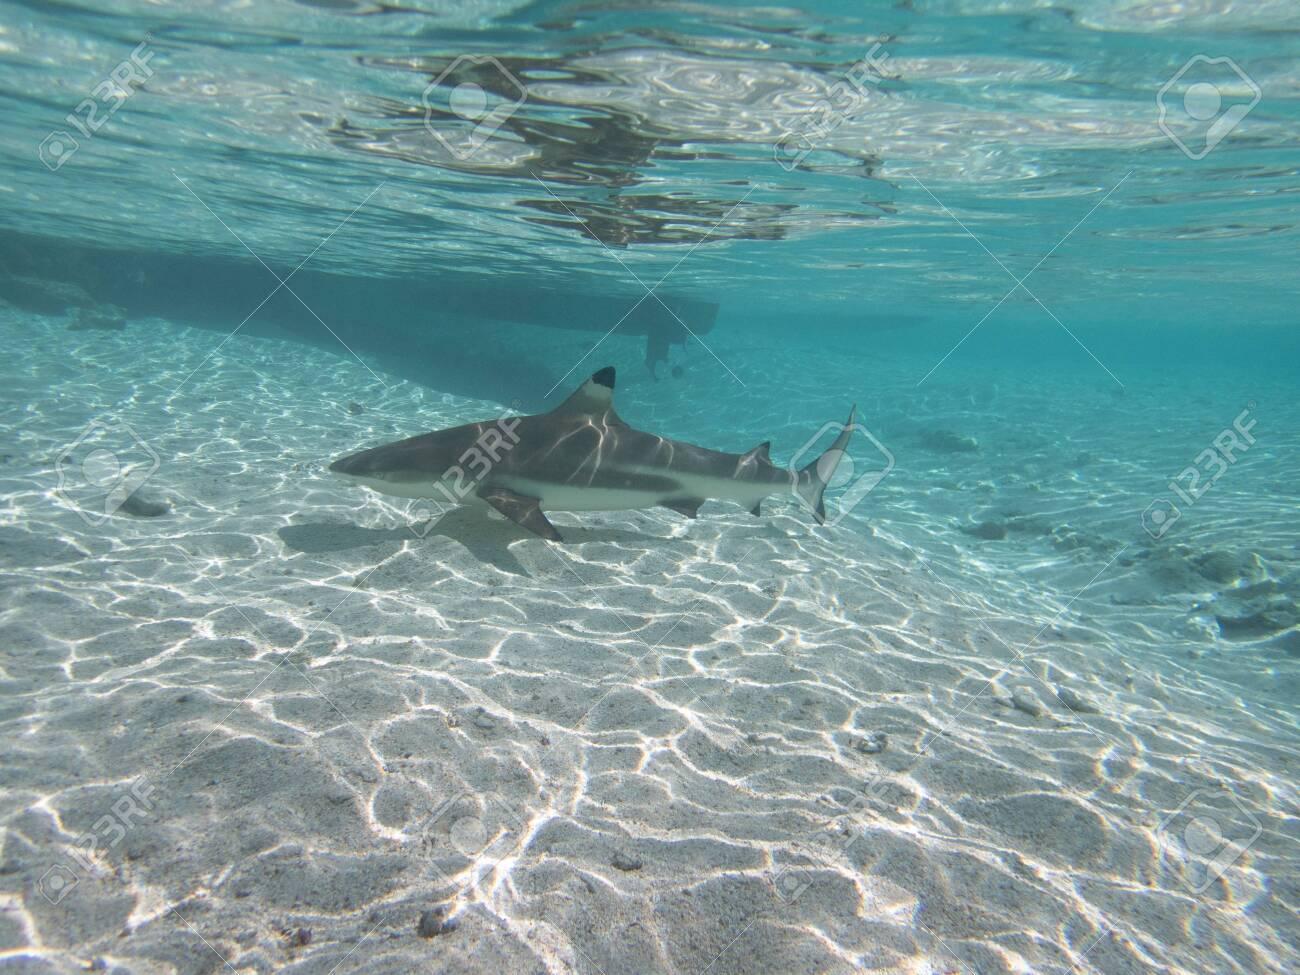 Blacktip Reef Shark in the lagoon off Moorea, French Polynesia next to Tahiti - 156618493